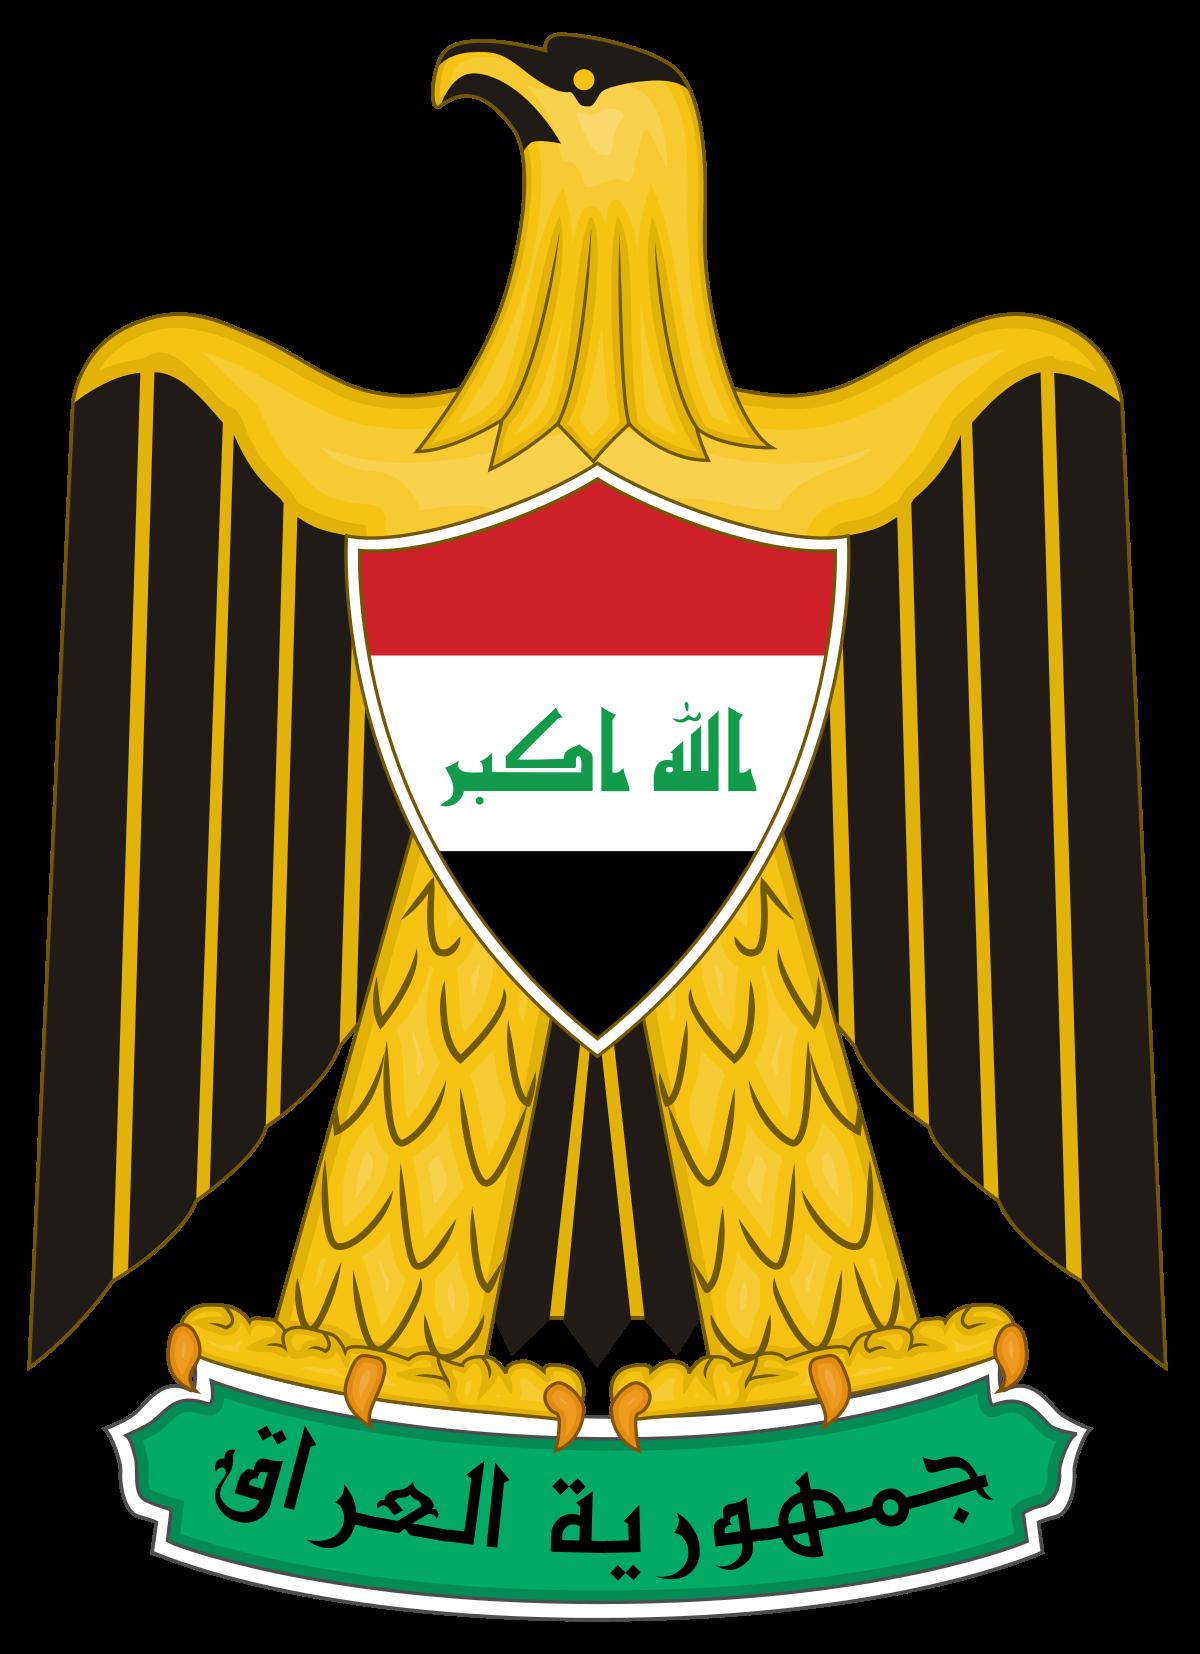 Kazakhstan eagle sun clipart svg transparent Coat of arms of Iraq - Wikipedia svg transparent